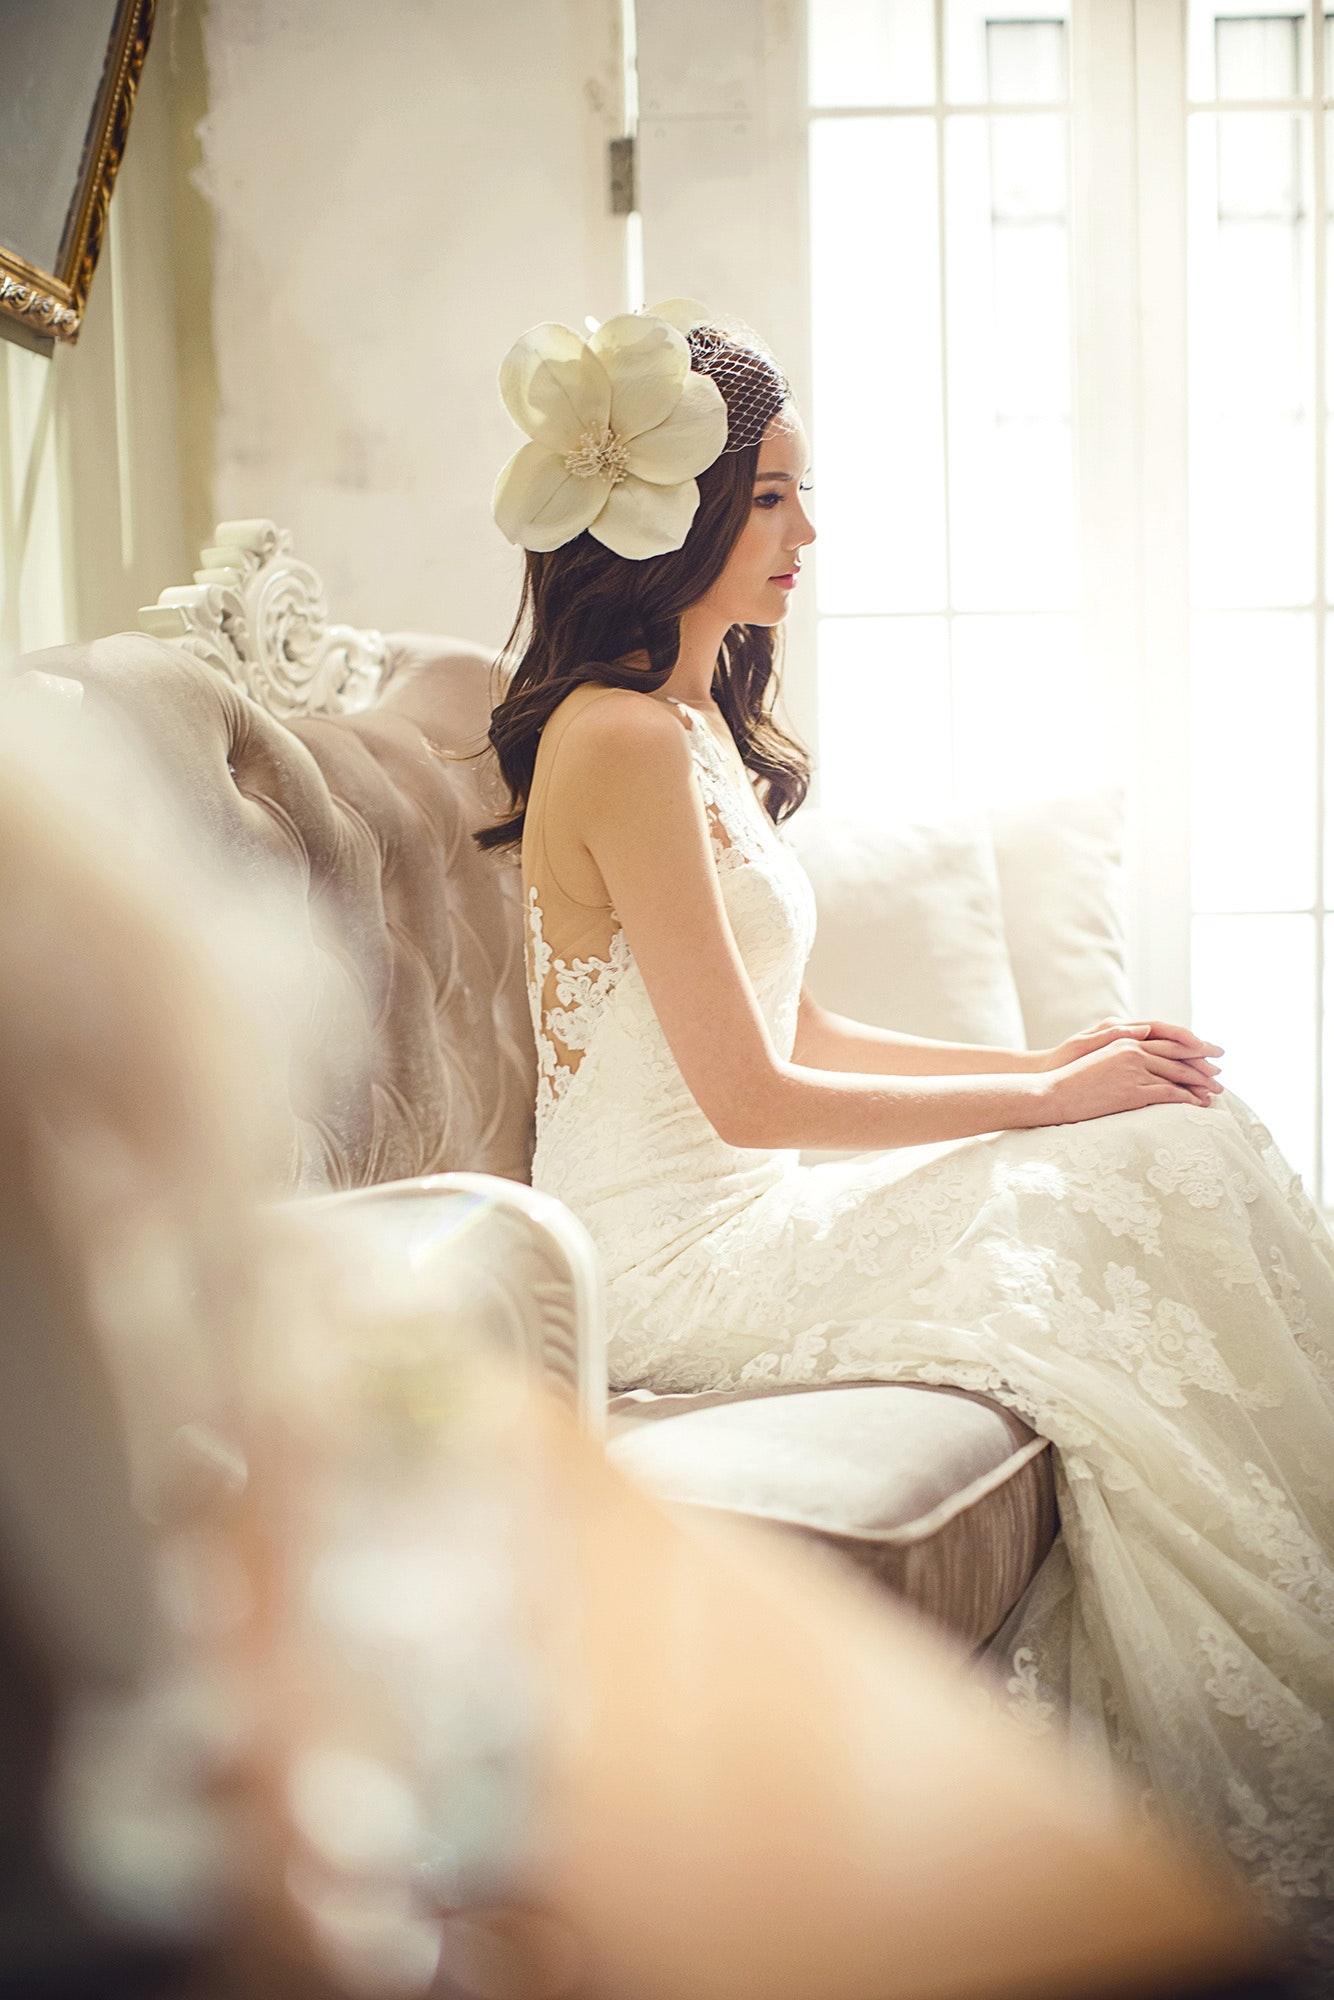 Woman in White Floral Wedding Dress, Beautiful, Bride, Dress, Flower, HQ Photo